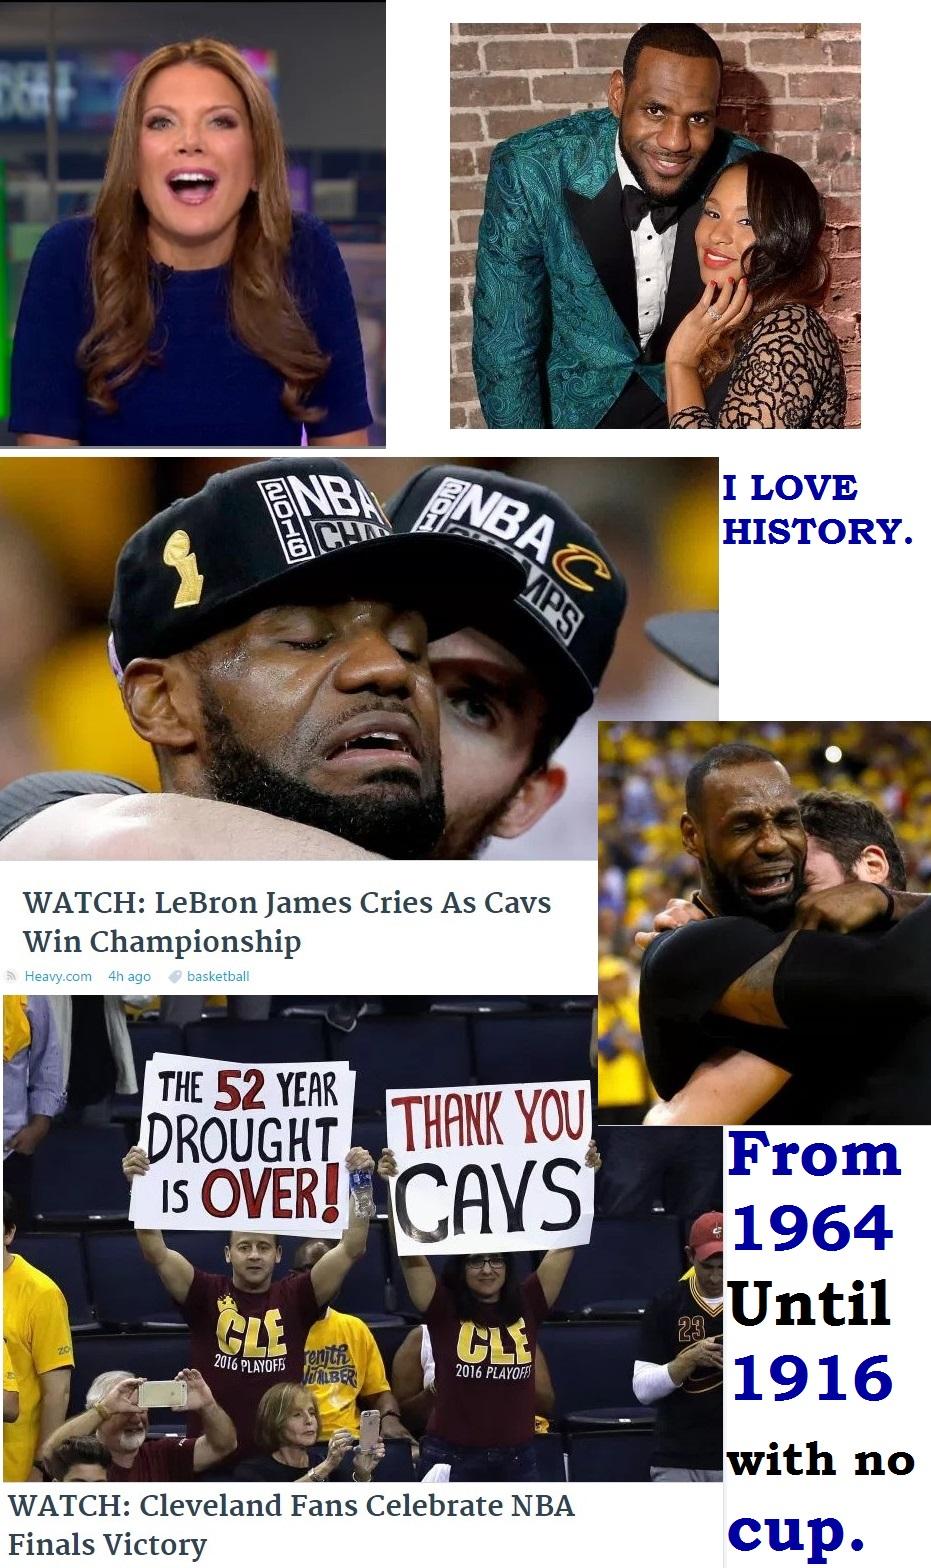 USA NBA CHAMPIONSHIP LEBRON JAMES CLEVELAND CAVALIERS 04 210616